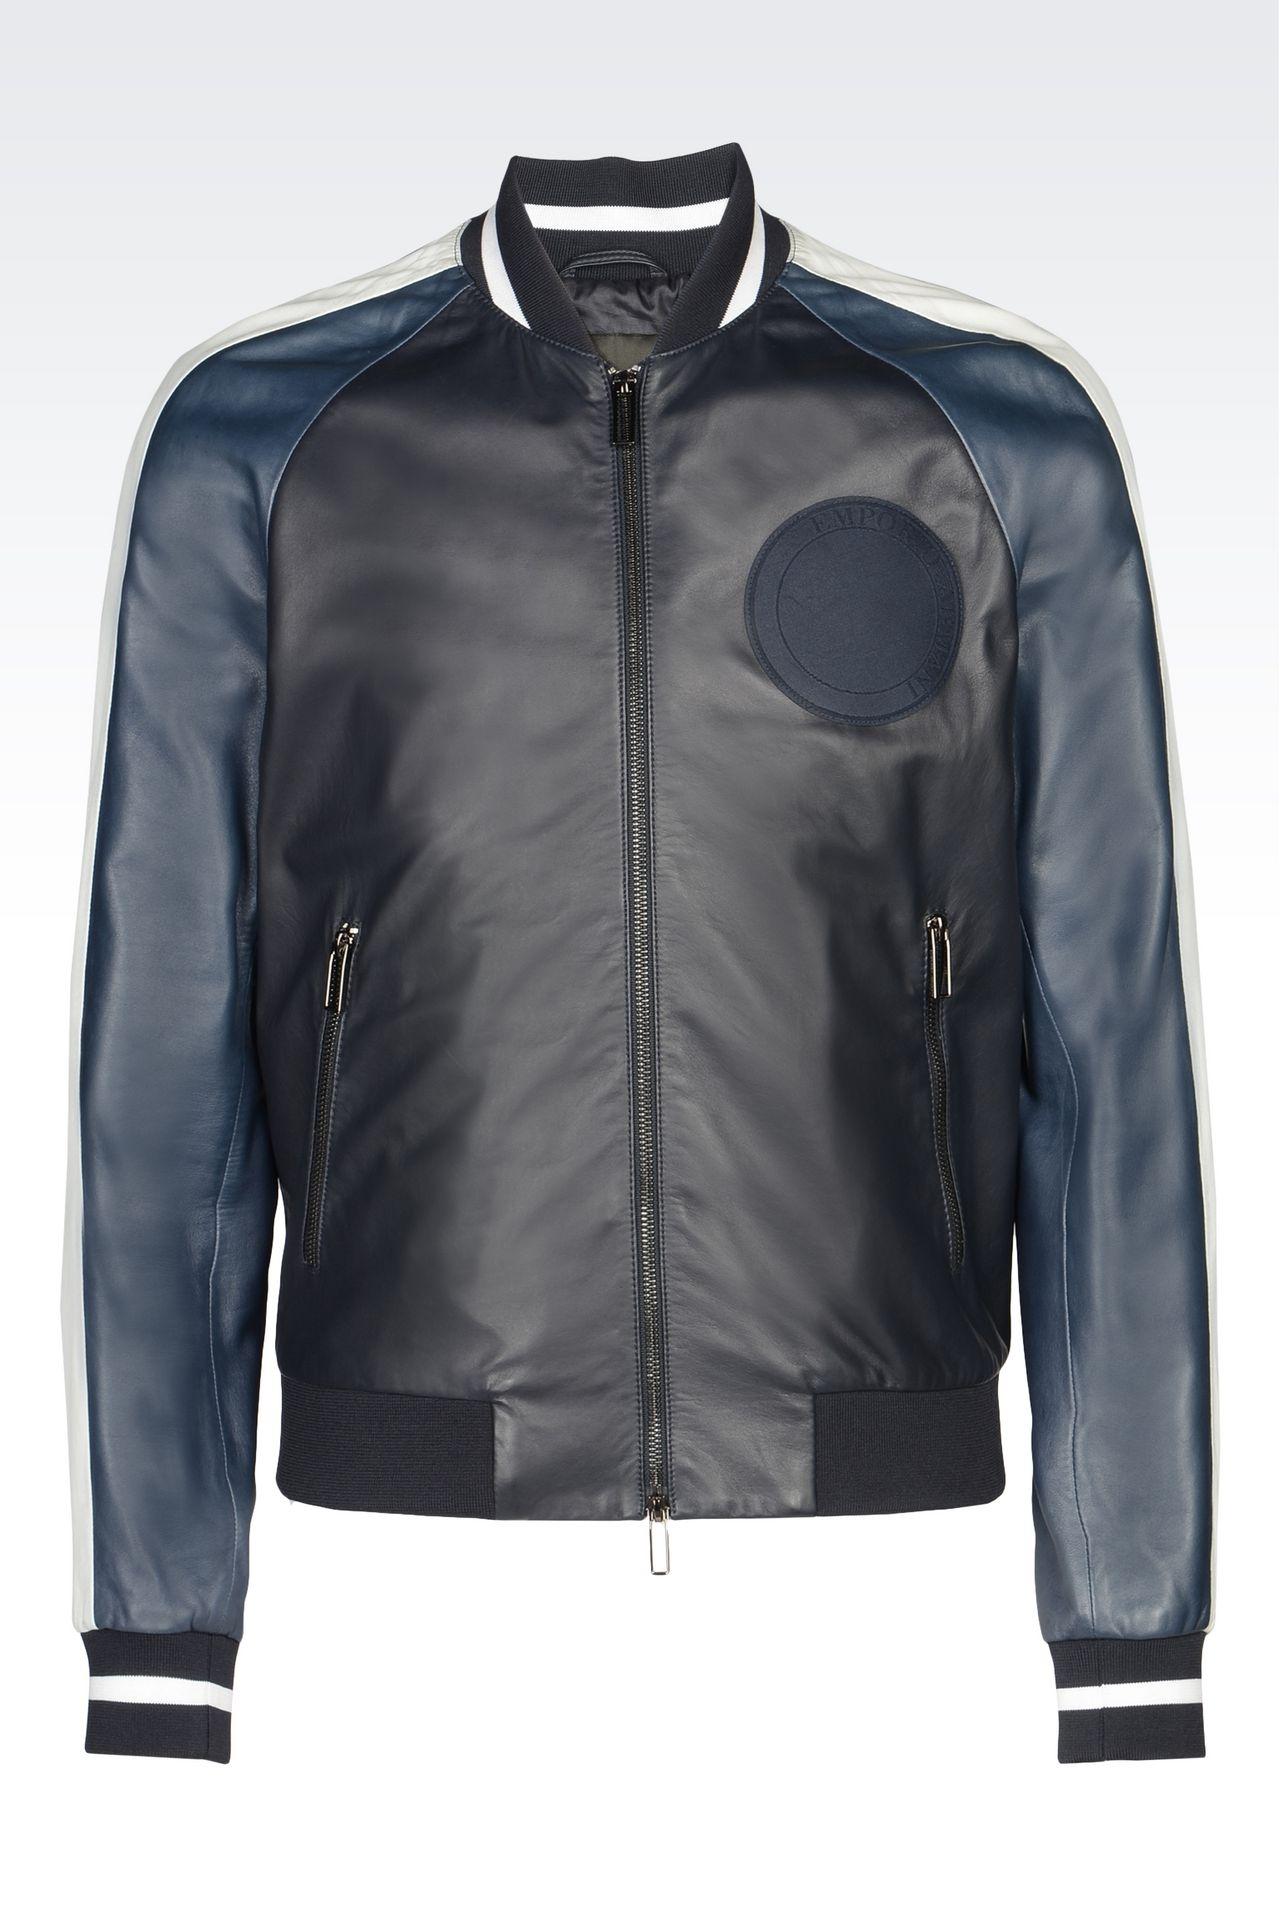 armani jackets armani light leather jackets men leatherwear VQOADNF